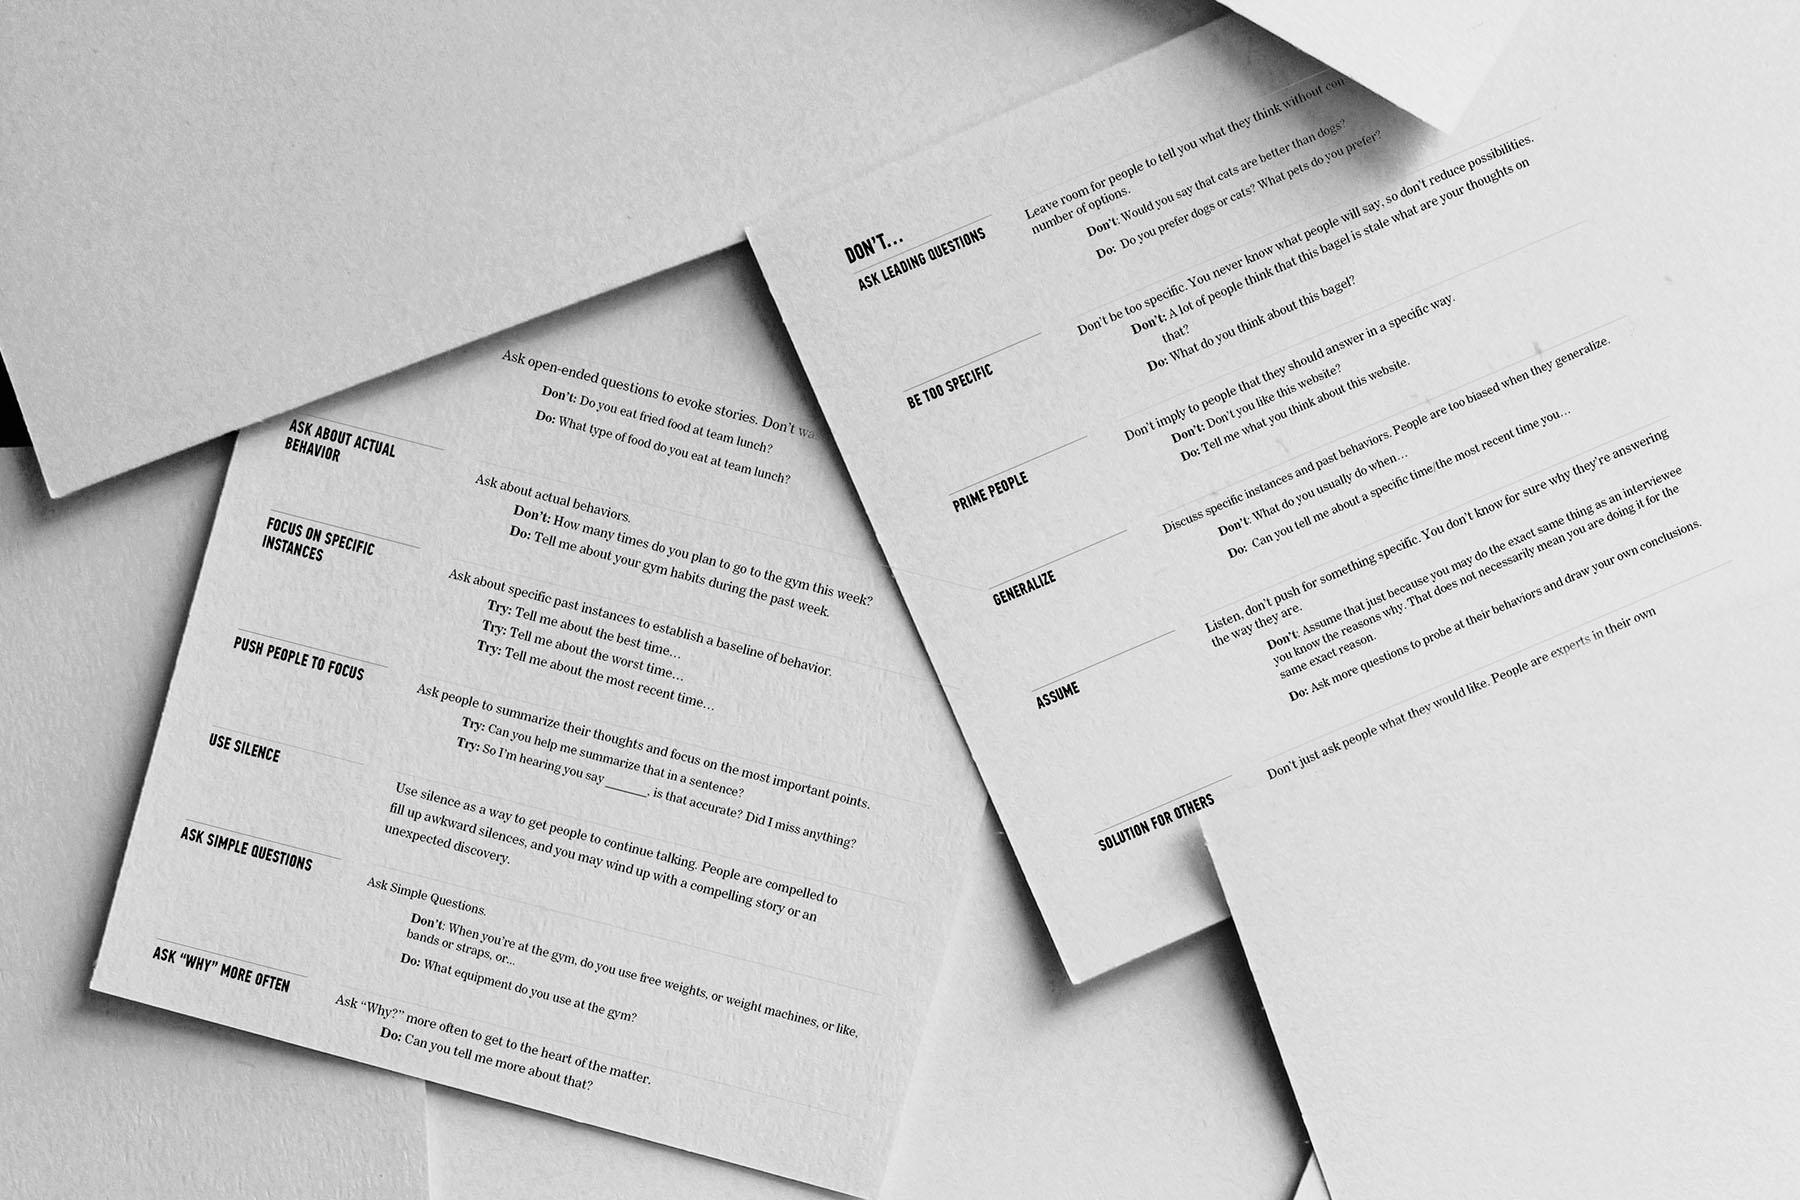 lauren-grace-design-freelance-ux-designer-london-uk-charity-ios-android-app-user-interviews-dos-and-donts.jpg